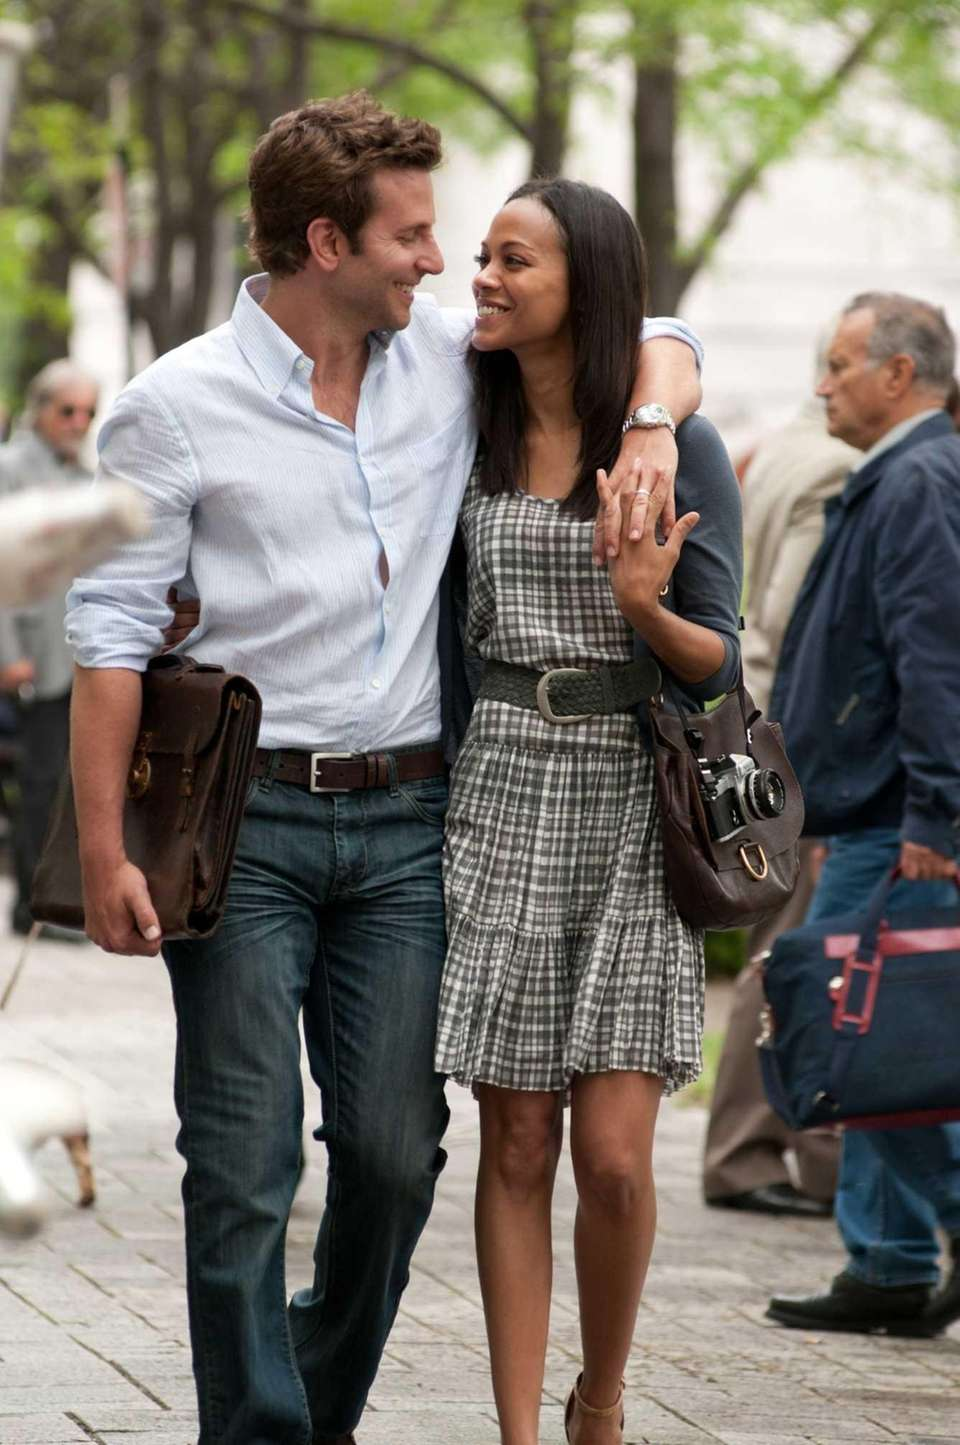 Bradley Cooper (as Rory Jansen) and Zoe Saldana